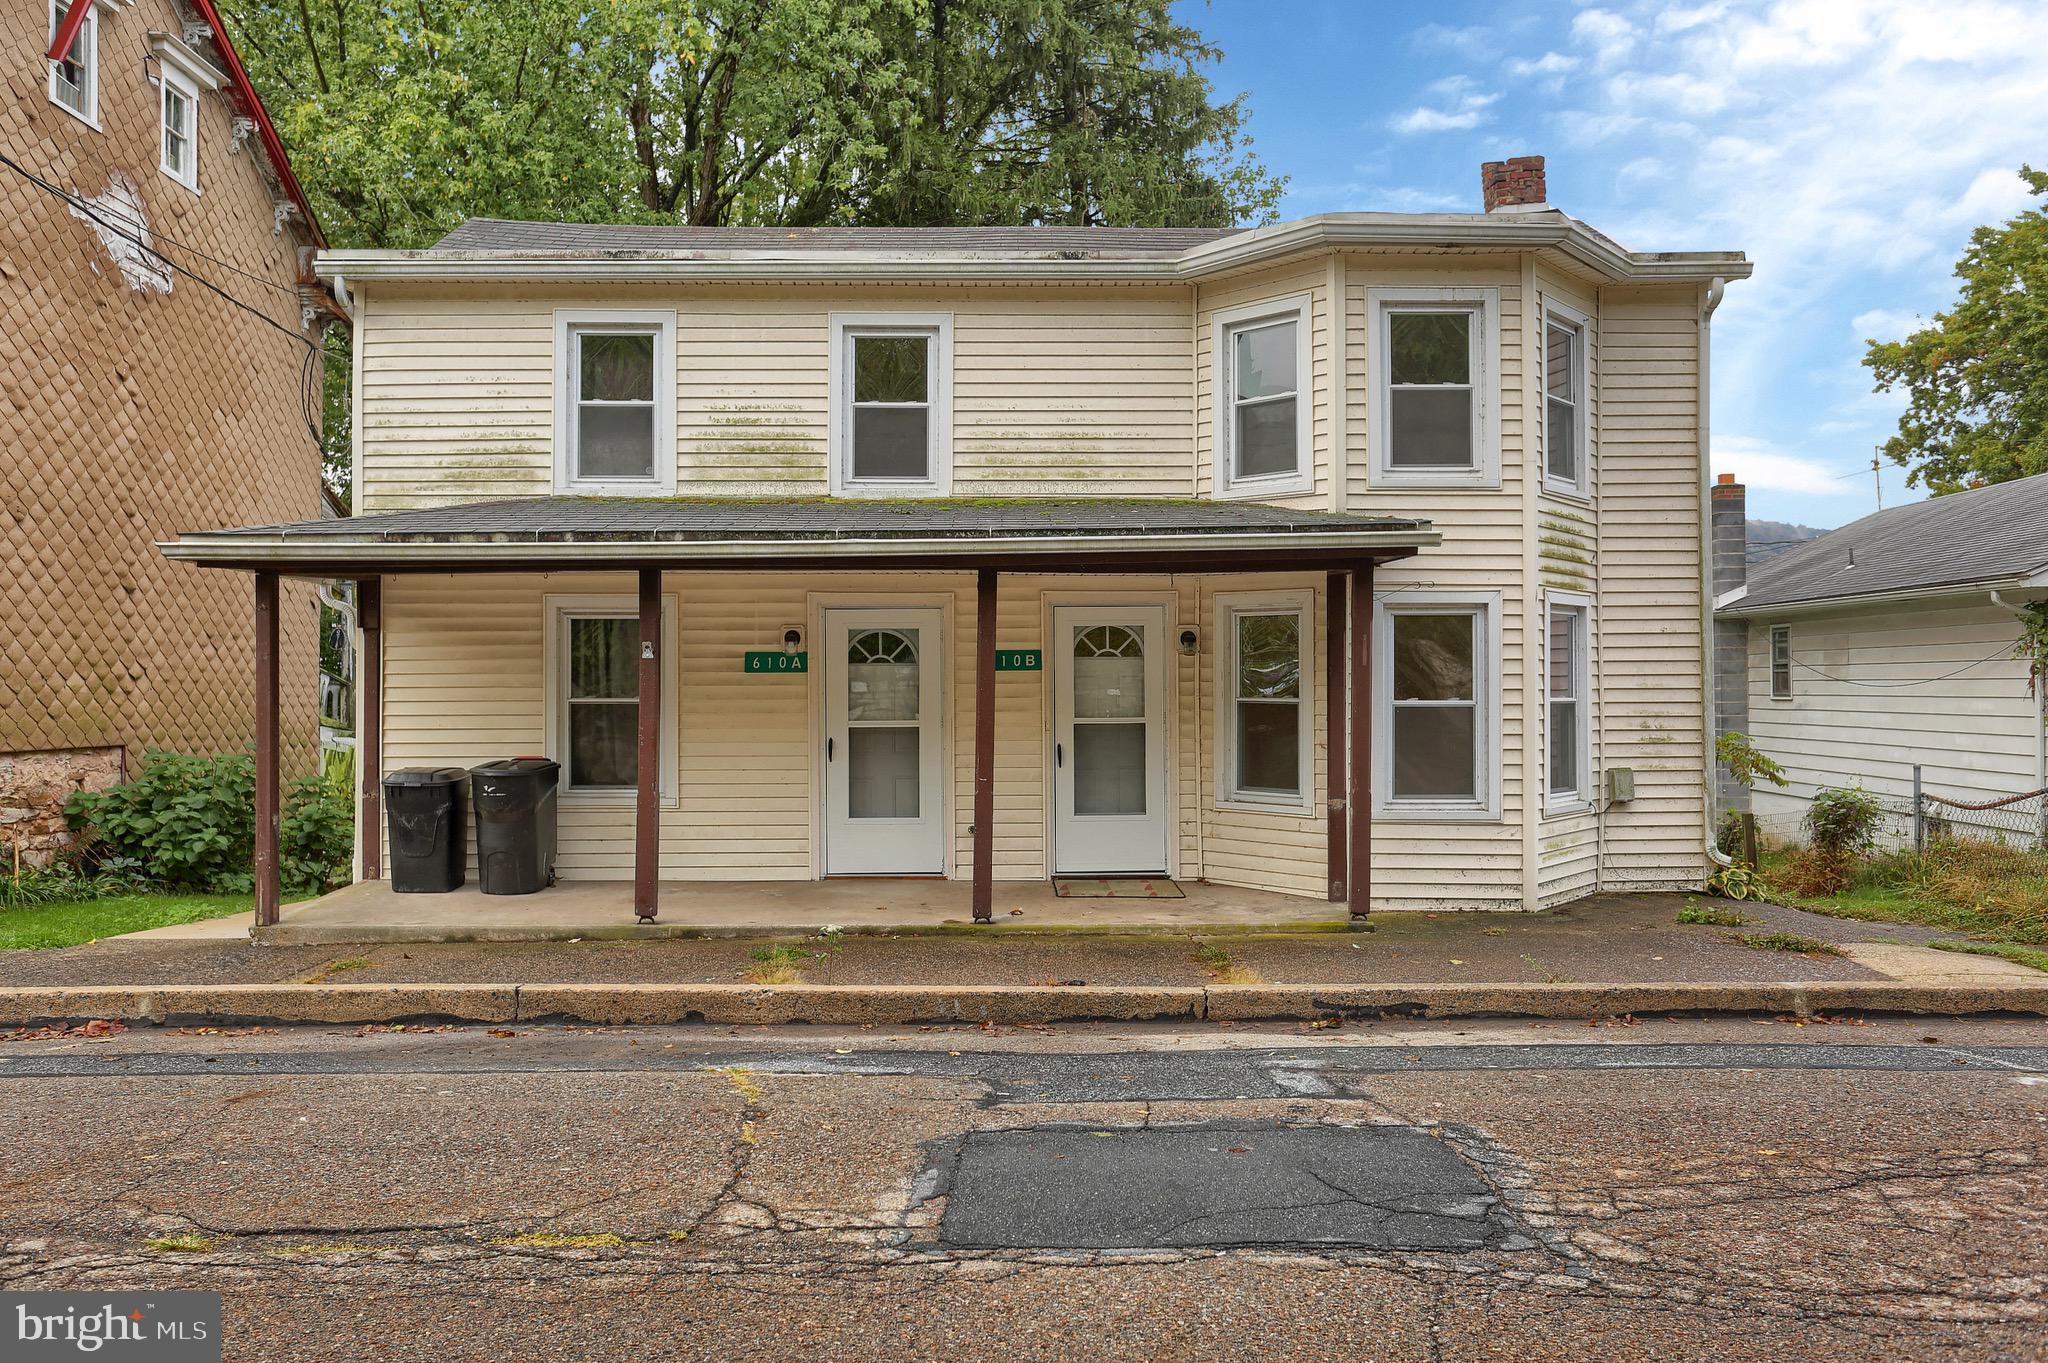 610 ERIE STREET, DAUPHIN, PA 17018